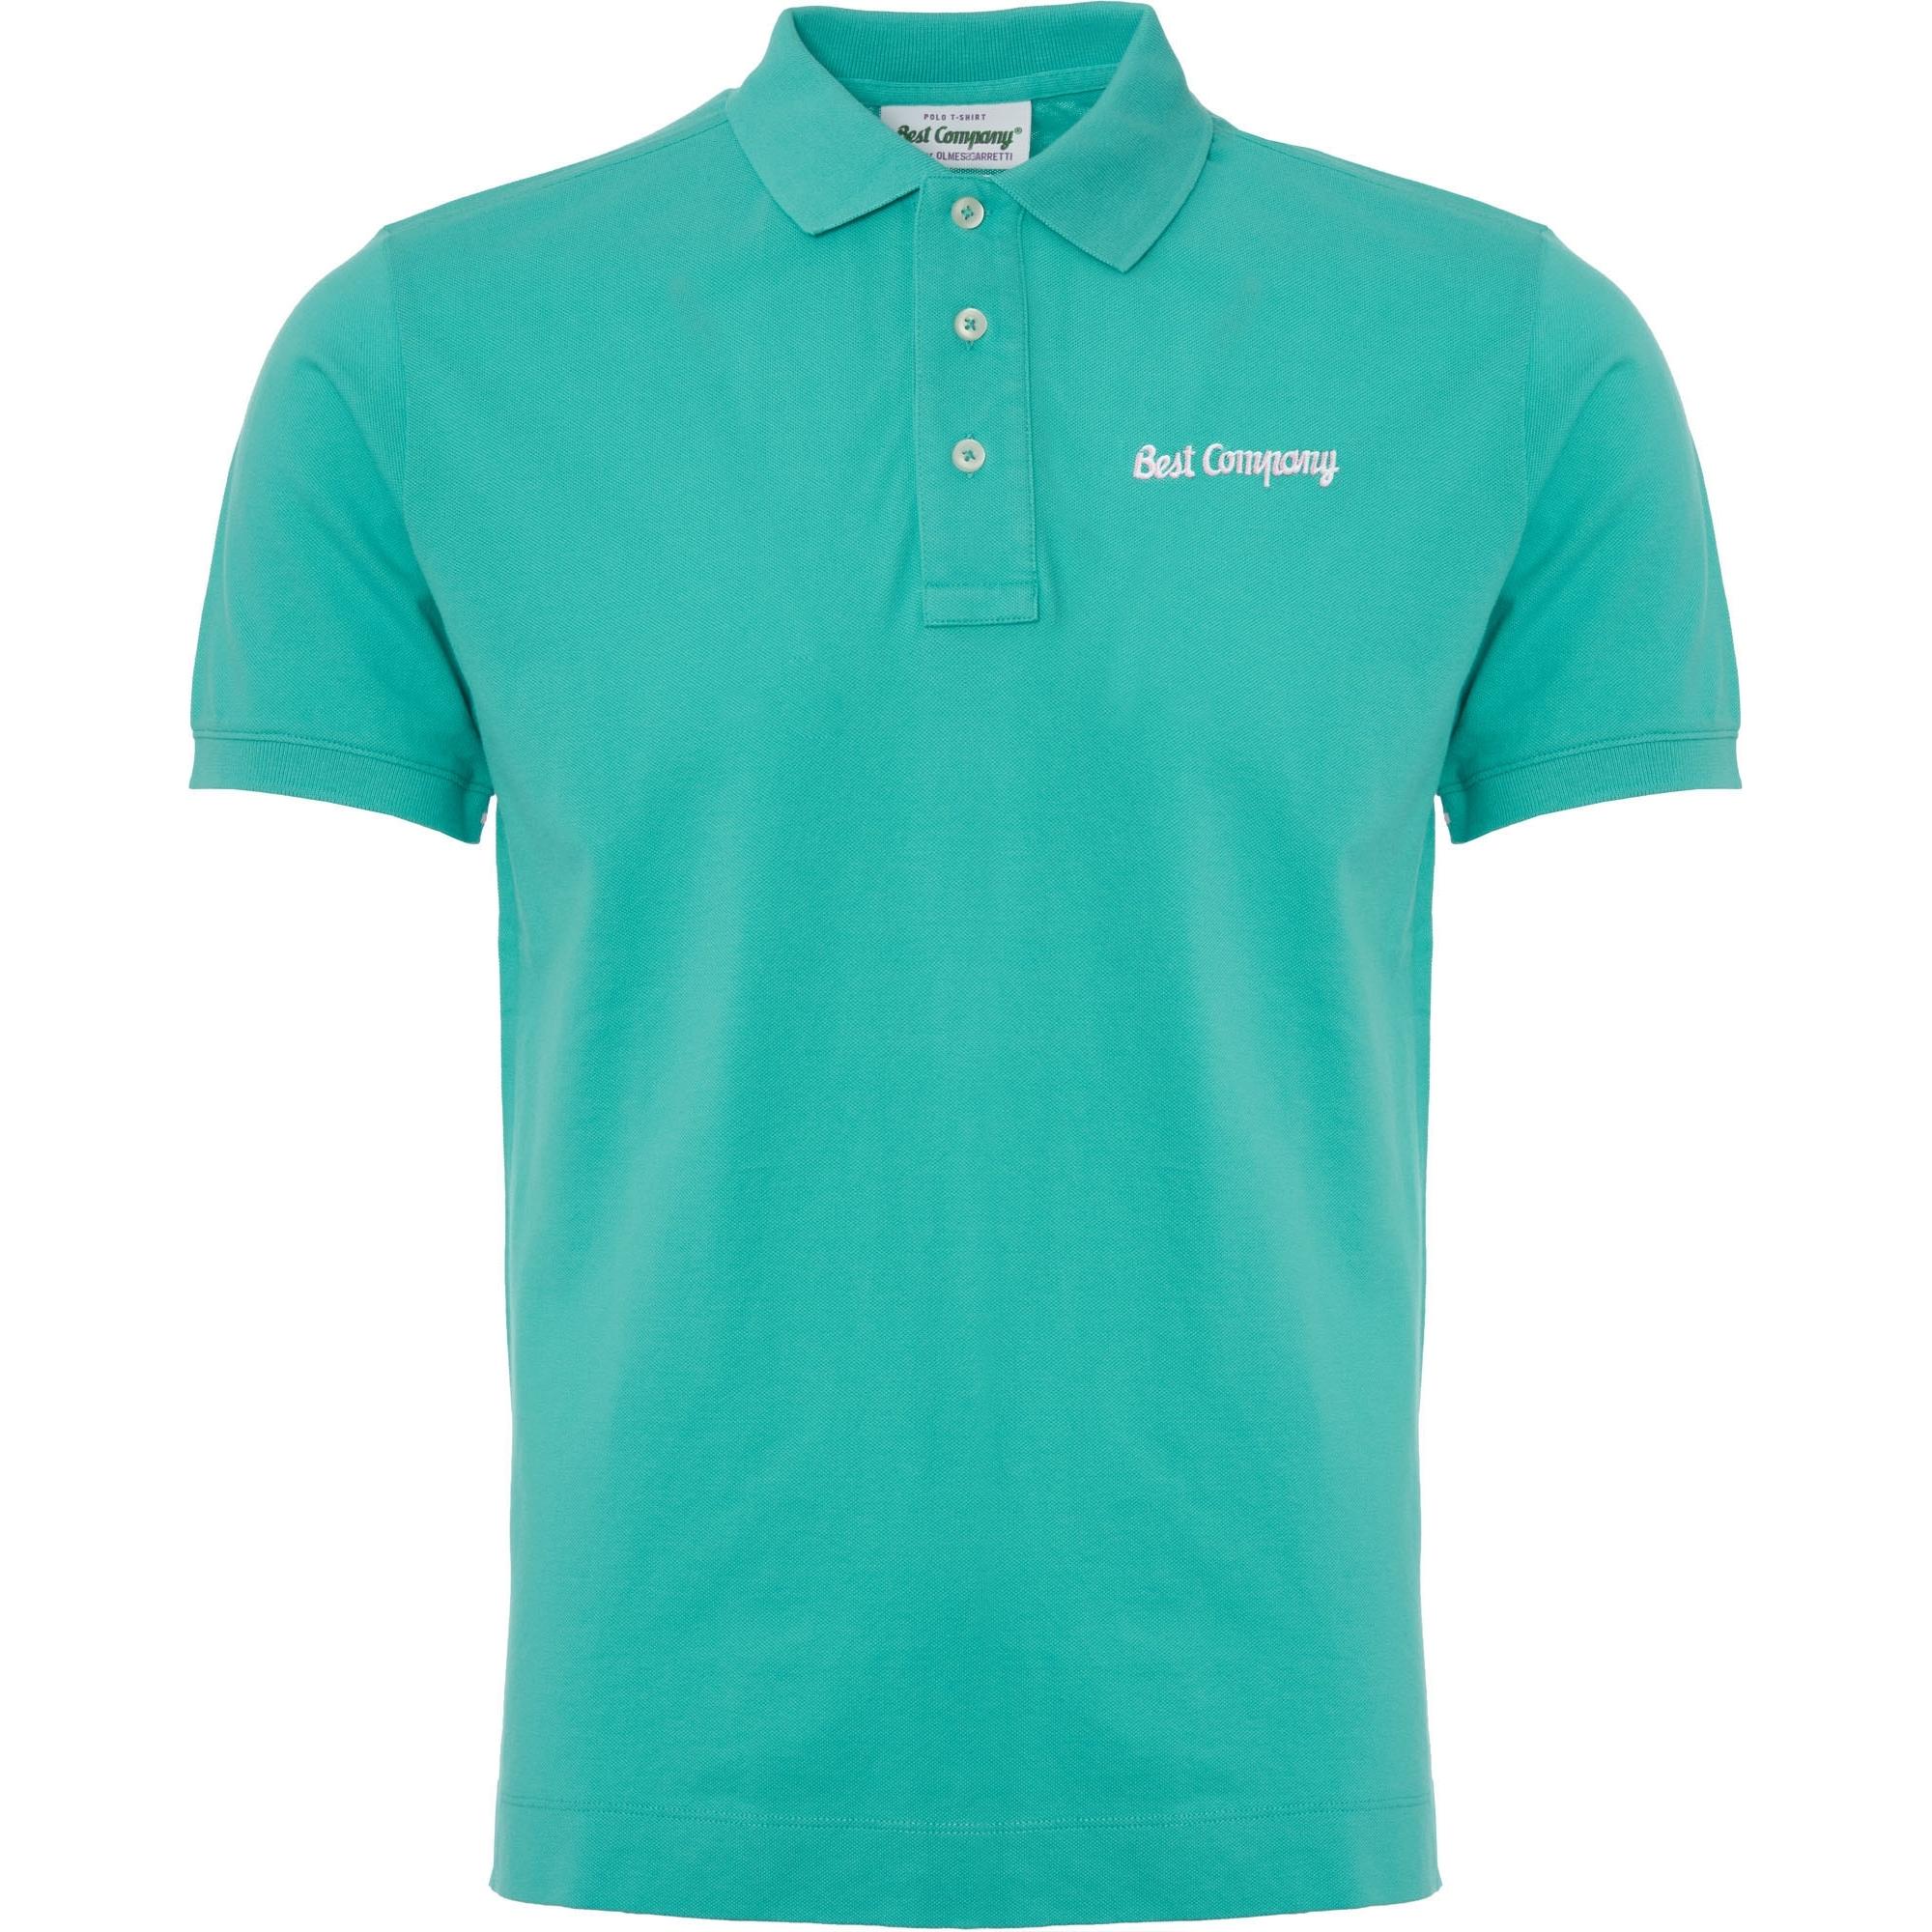 c5aed6afb Best Company Classic Polo Shirt | Maldive | 692034-415